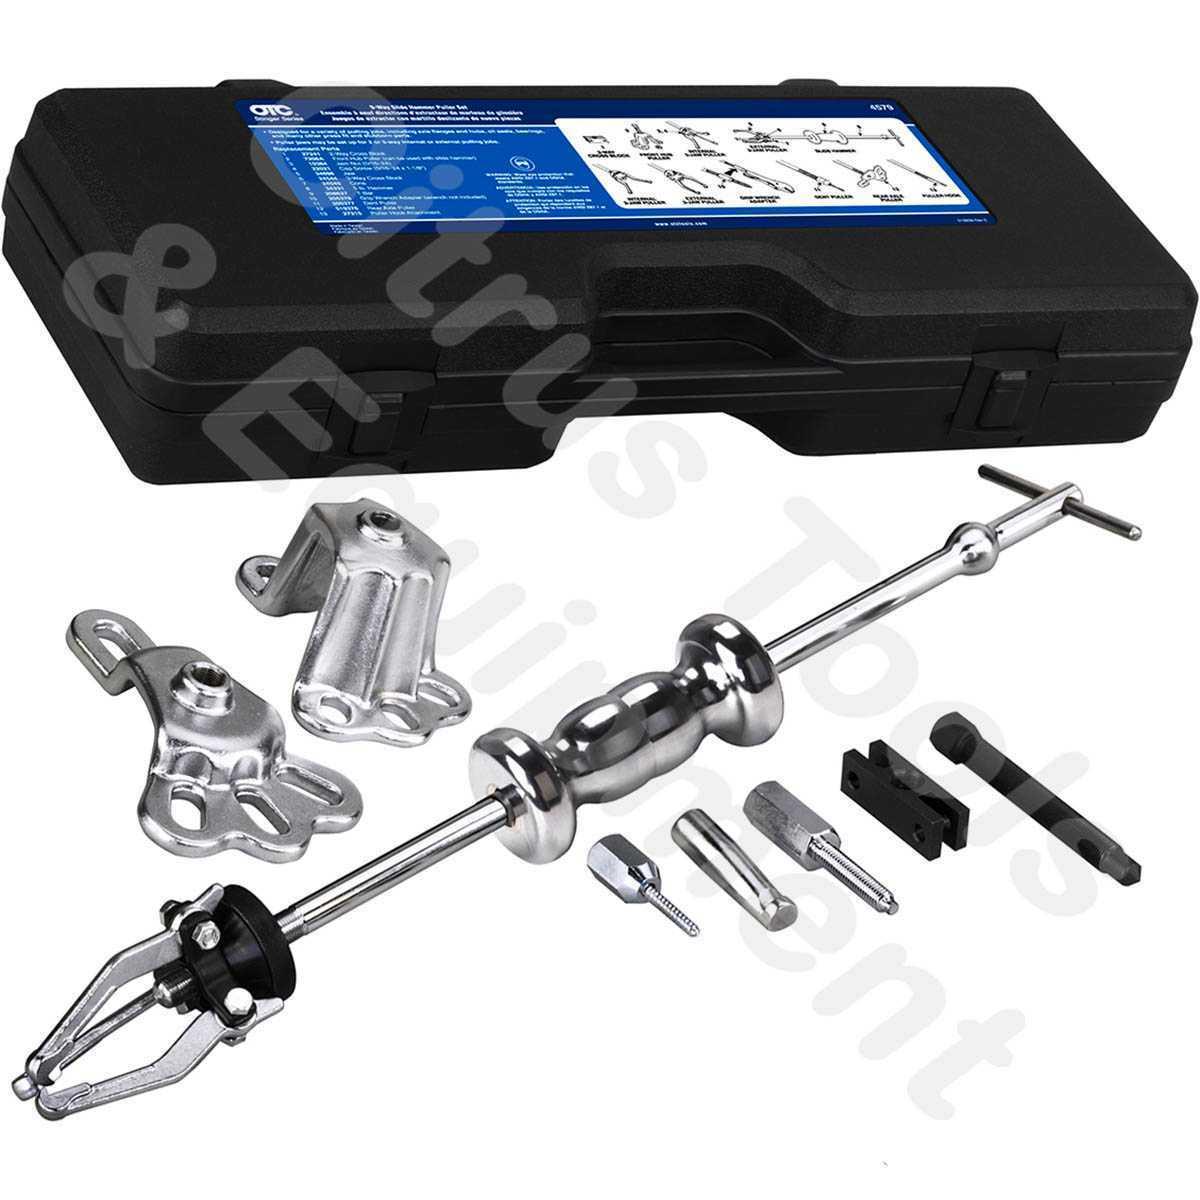 Gear Puller Set : Otc tools way slide hammer gear puller set with